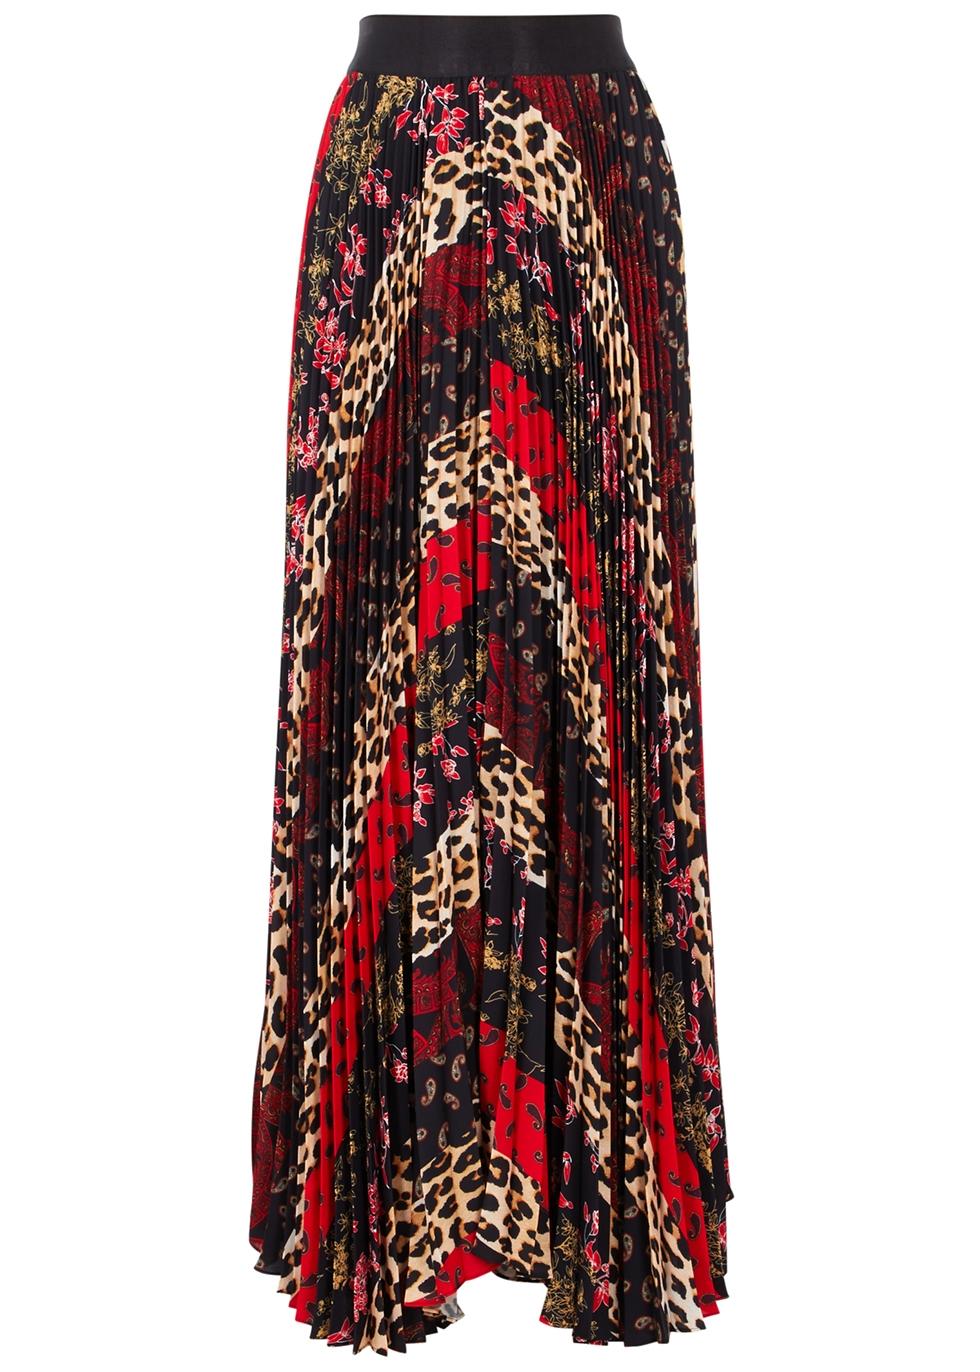 Katz Sunburst Printed Maxi Skirt in Multicoloured